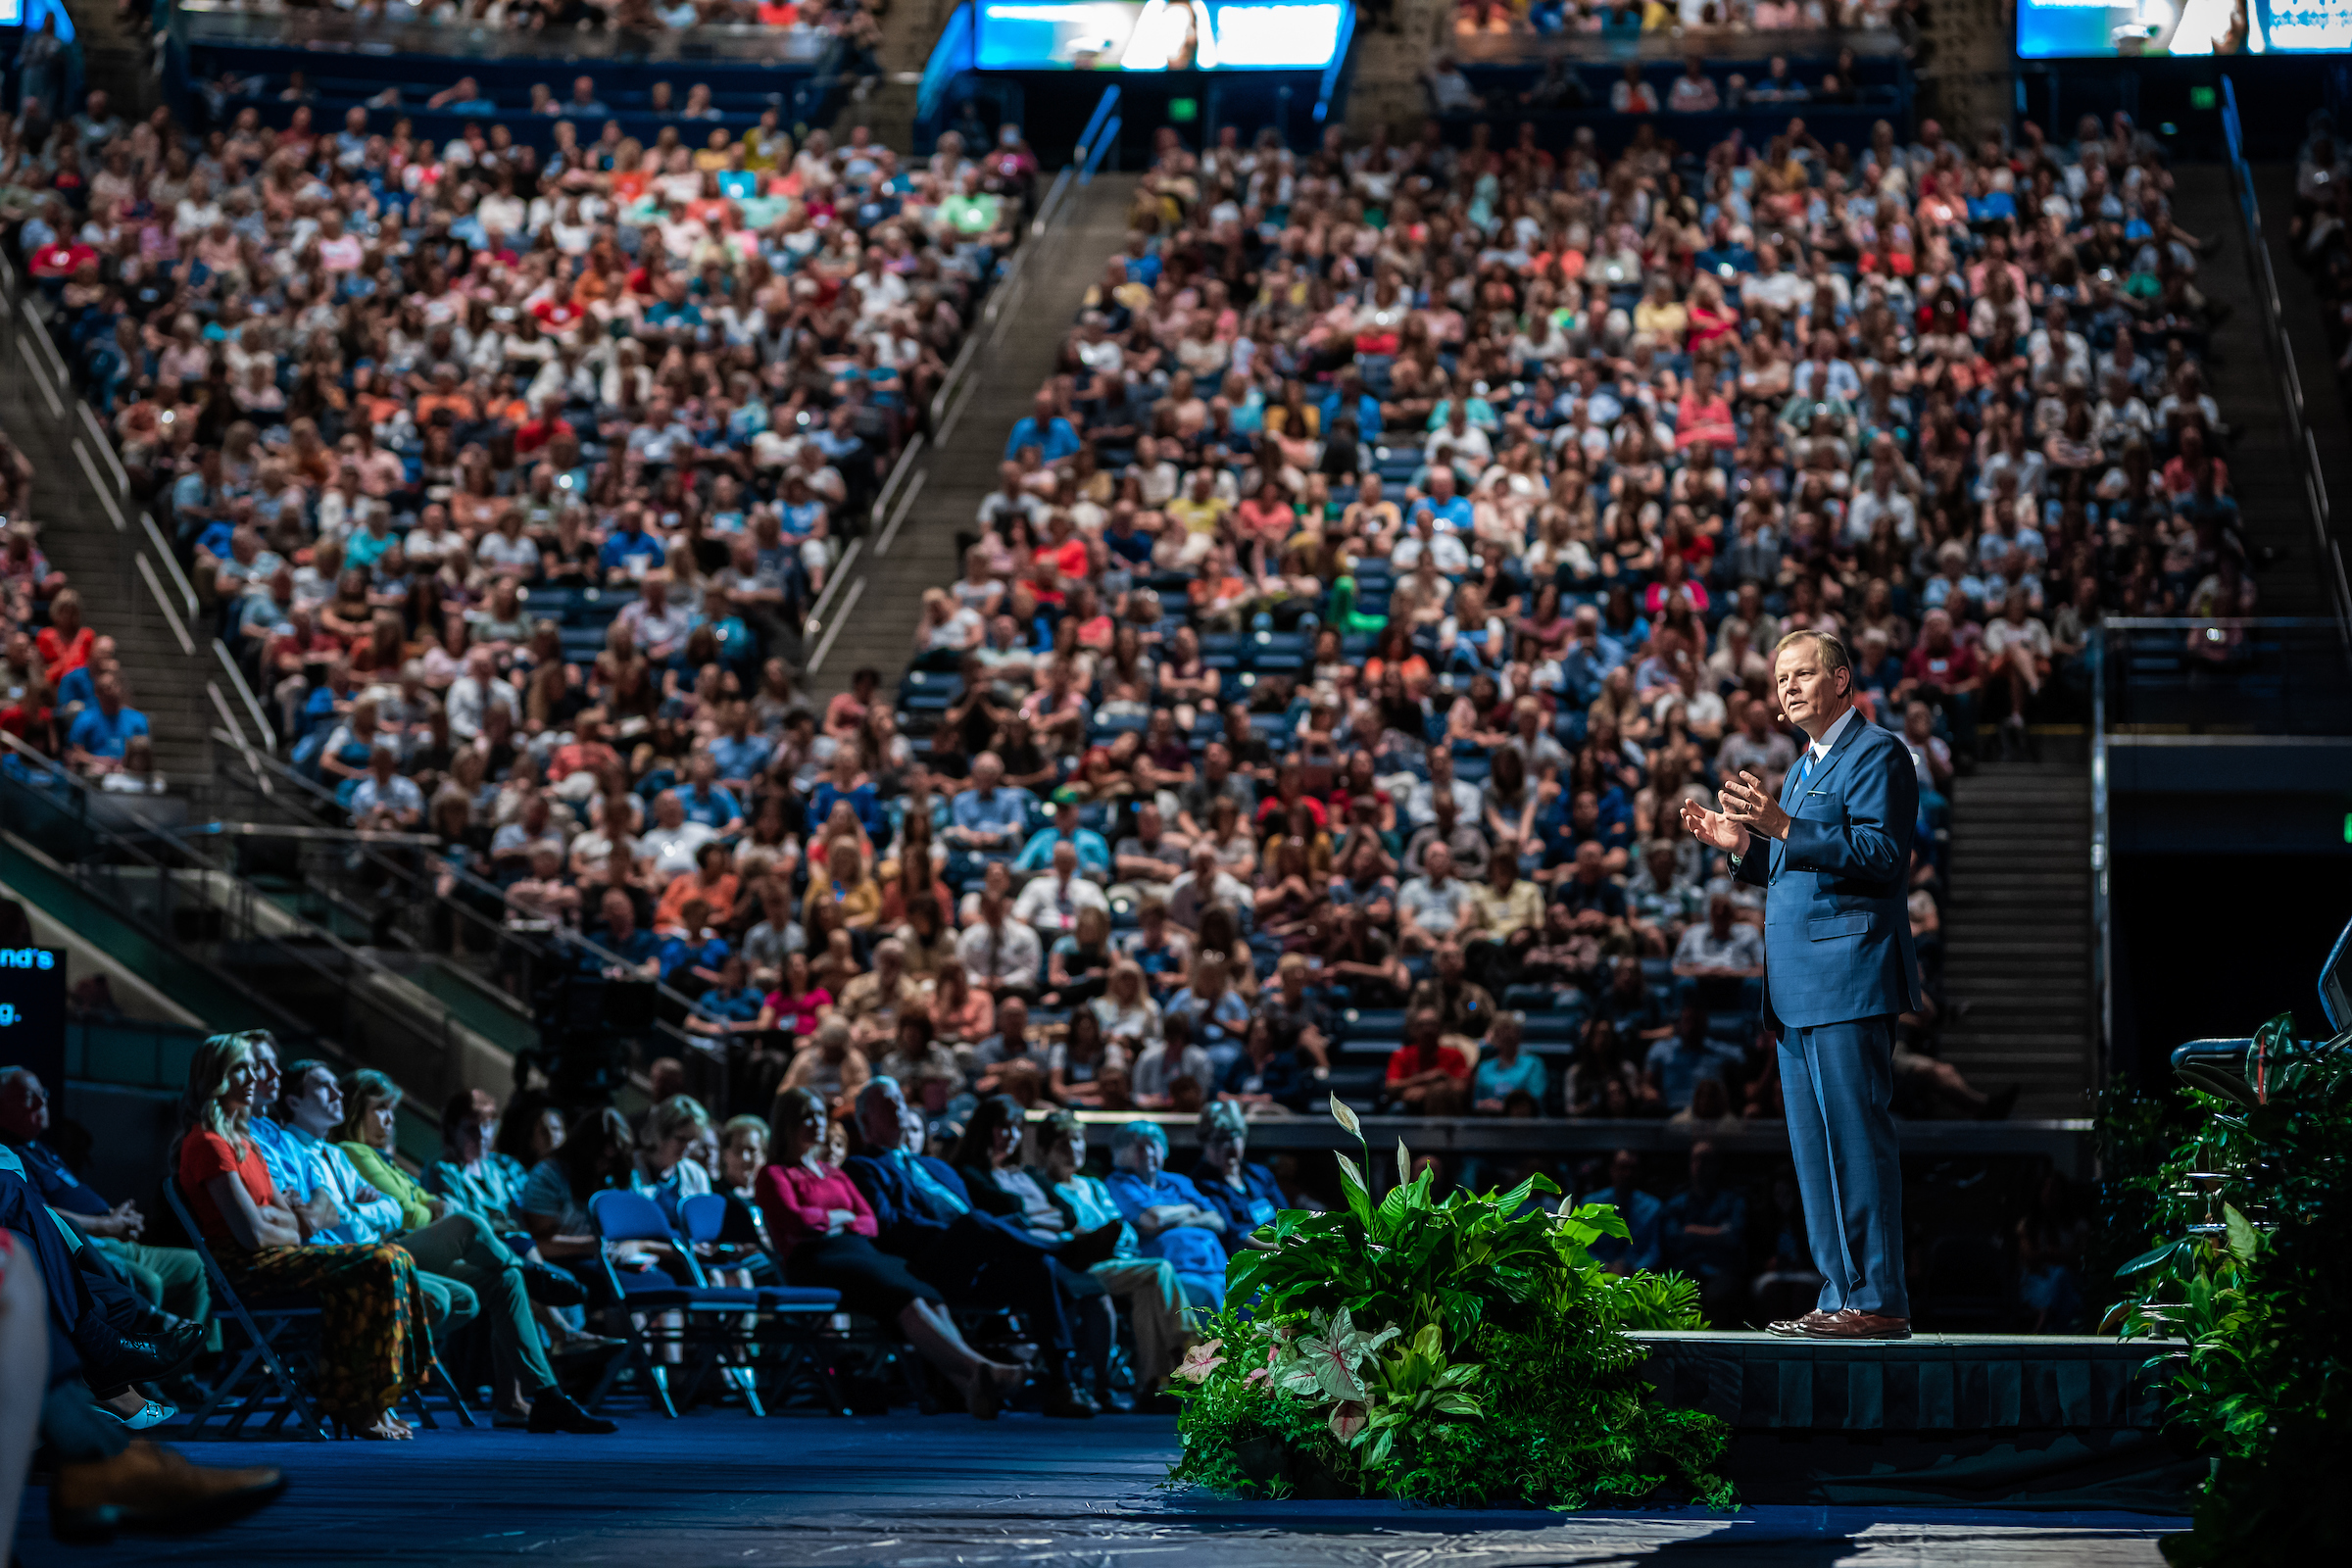 Elder Gary E. Stevenson speaks at a BYU devotional, during Education Week, Tuesday, August 20 2019.